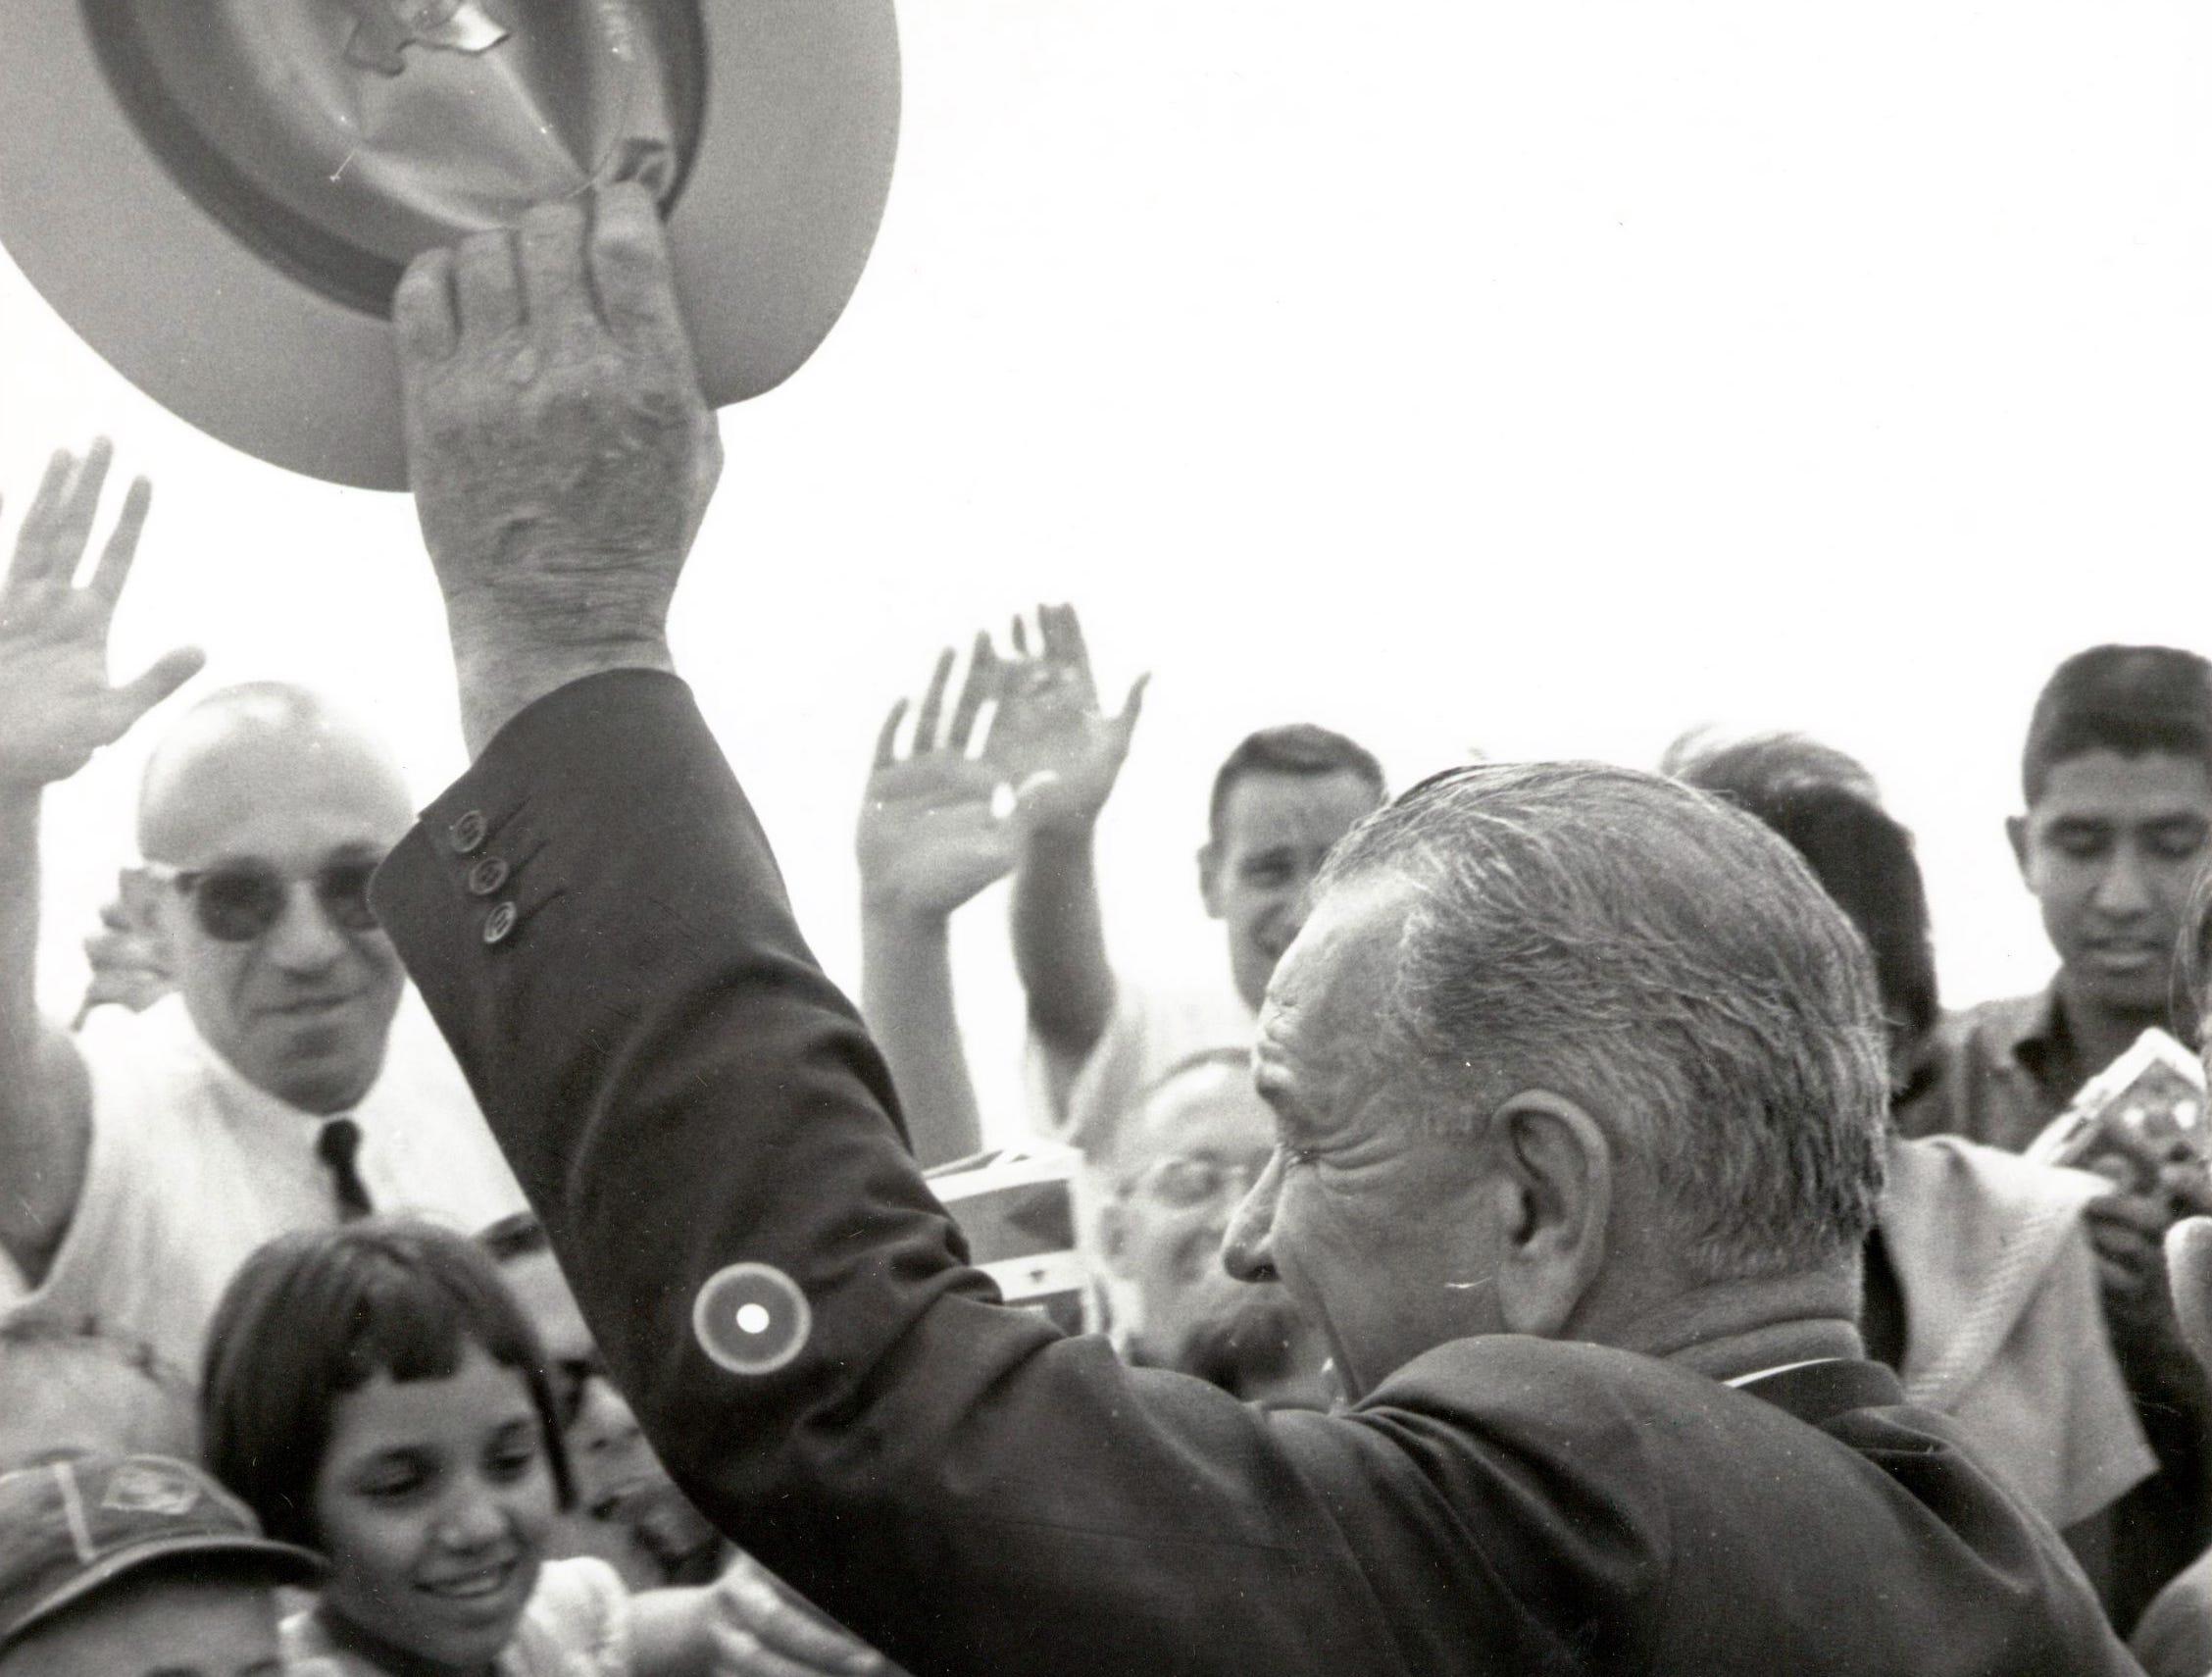 September 25, 1964 - President Lyndon Johnson waves to the crowd.